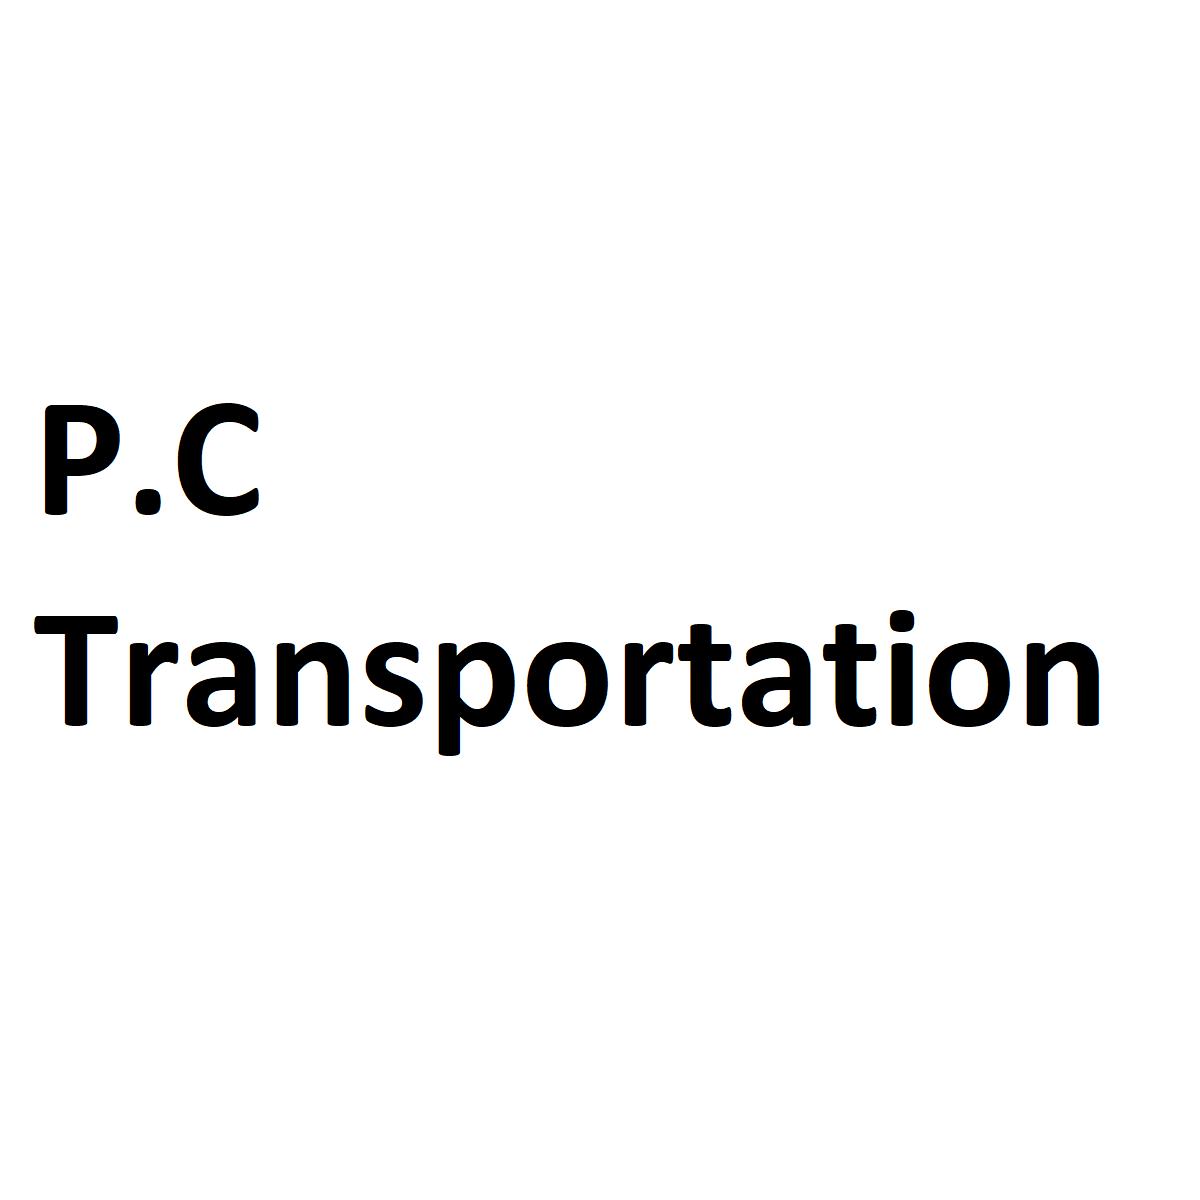 P.C Transportation